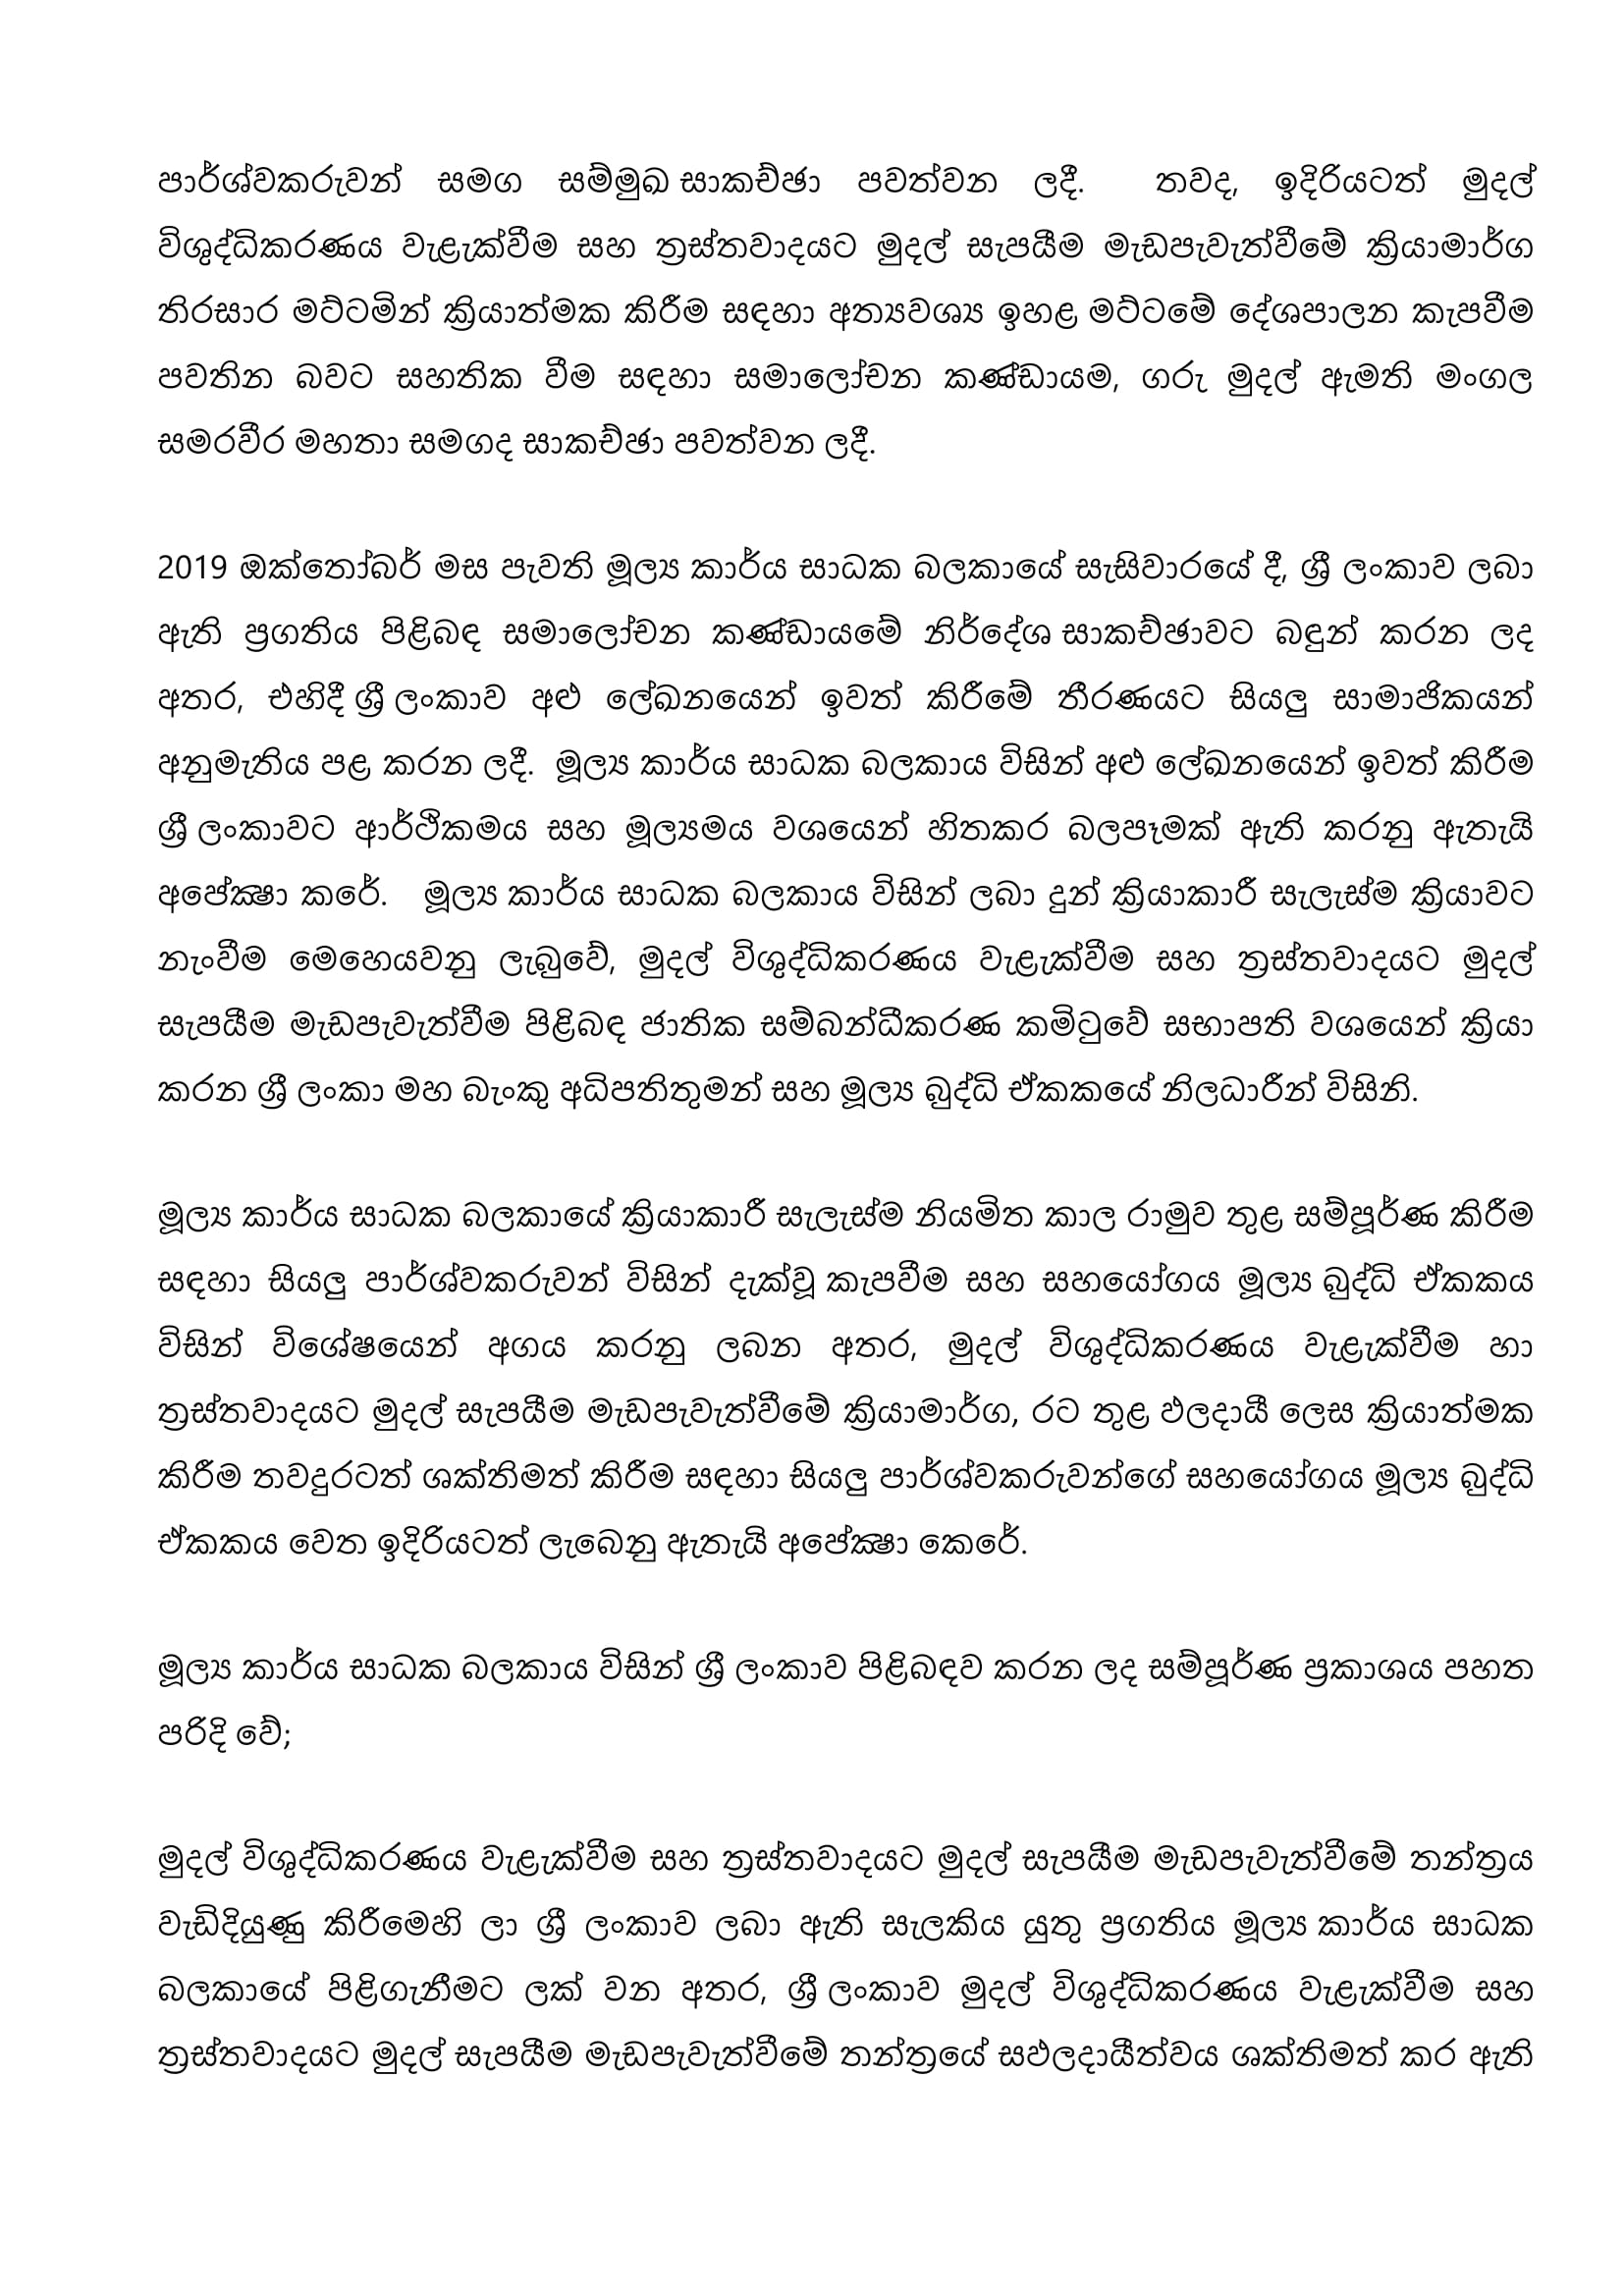 Press Release - 2019 10 21 Sinhala-3